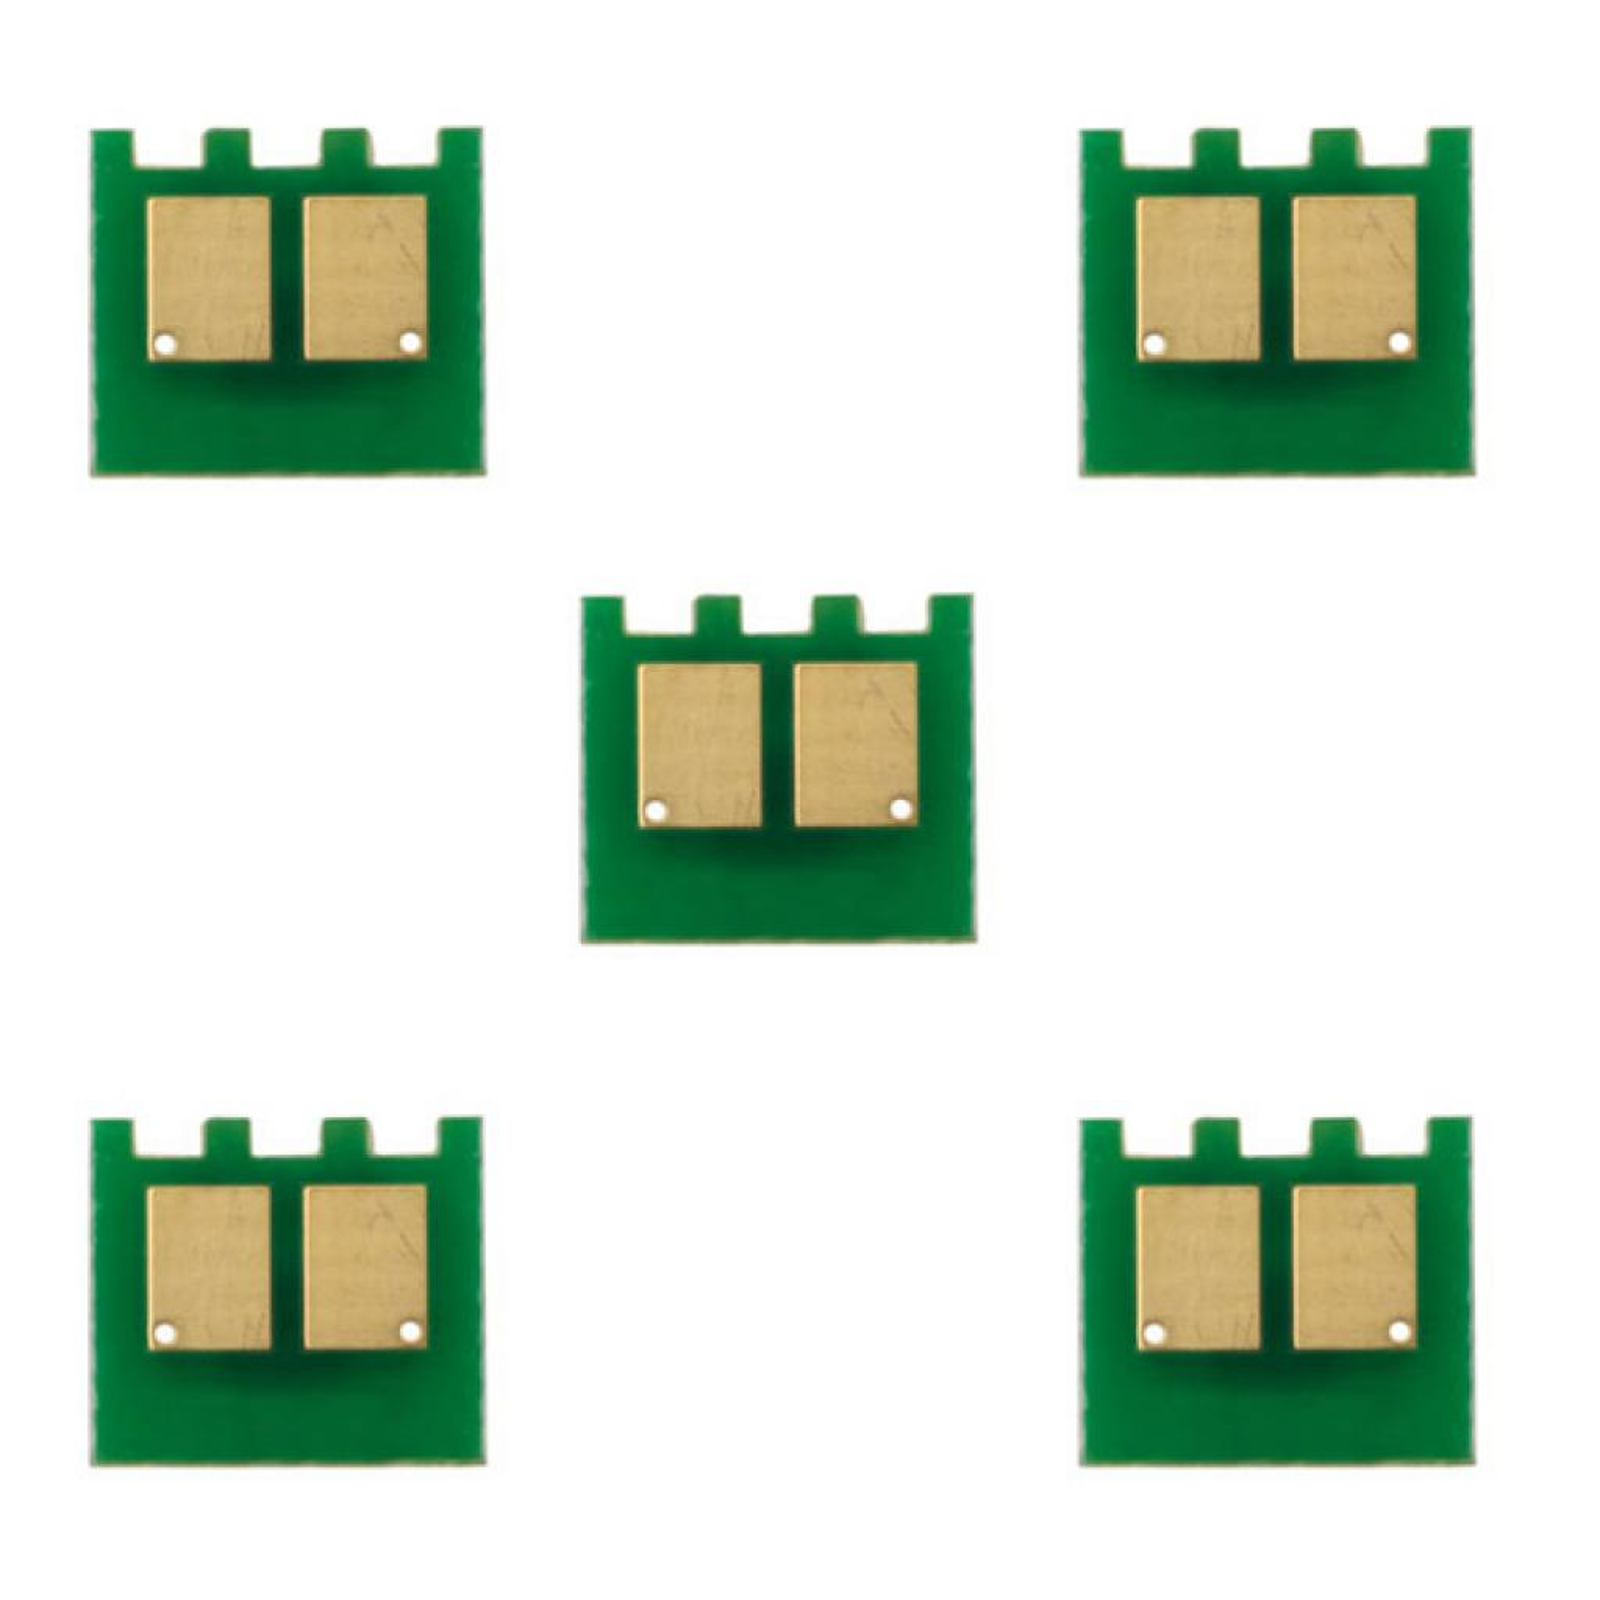 Чип для картриджа HP CLJ Pro M476 (MPS) (CF383A) 3.5k magenta Static Control (XTH476CP-MA)